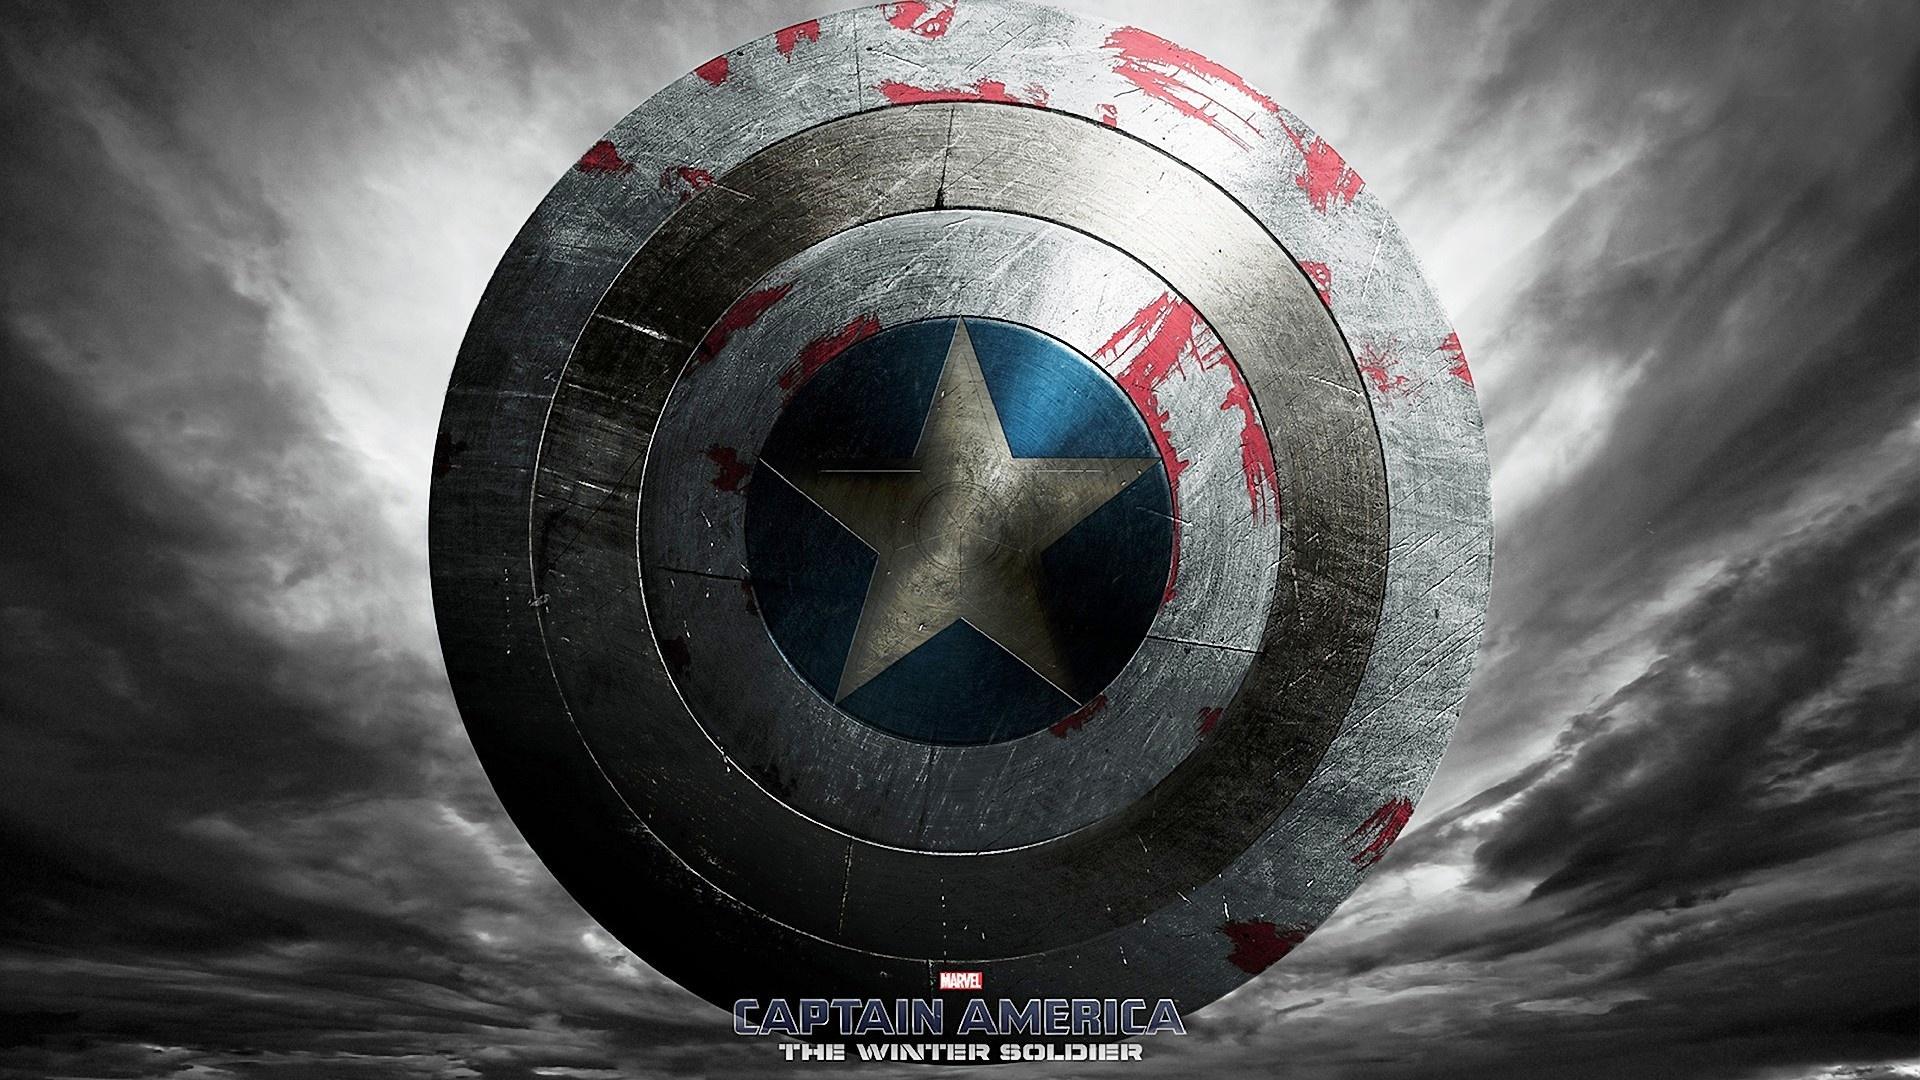 captain america shield the winter soldier movie 2014 hd wallpaper 1920x1080